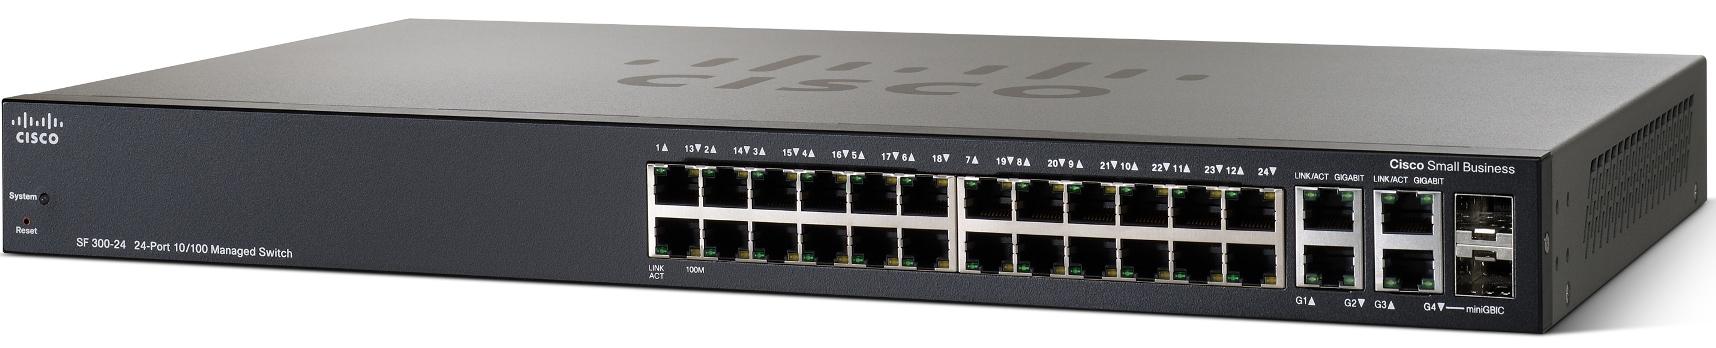 Cisco SF300-24, 24x10/100 +2xGig+2xComboSFP Switch